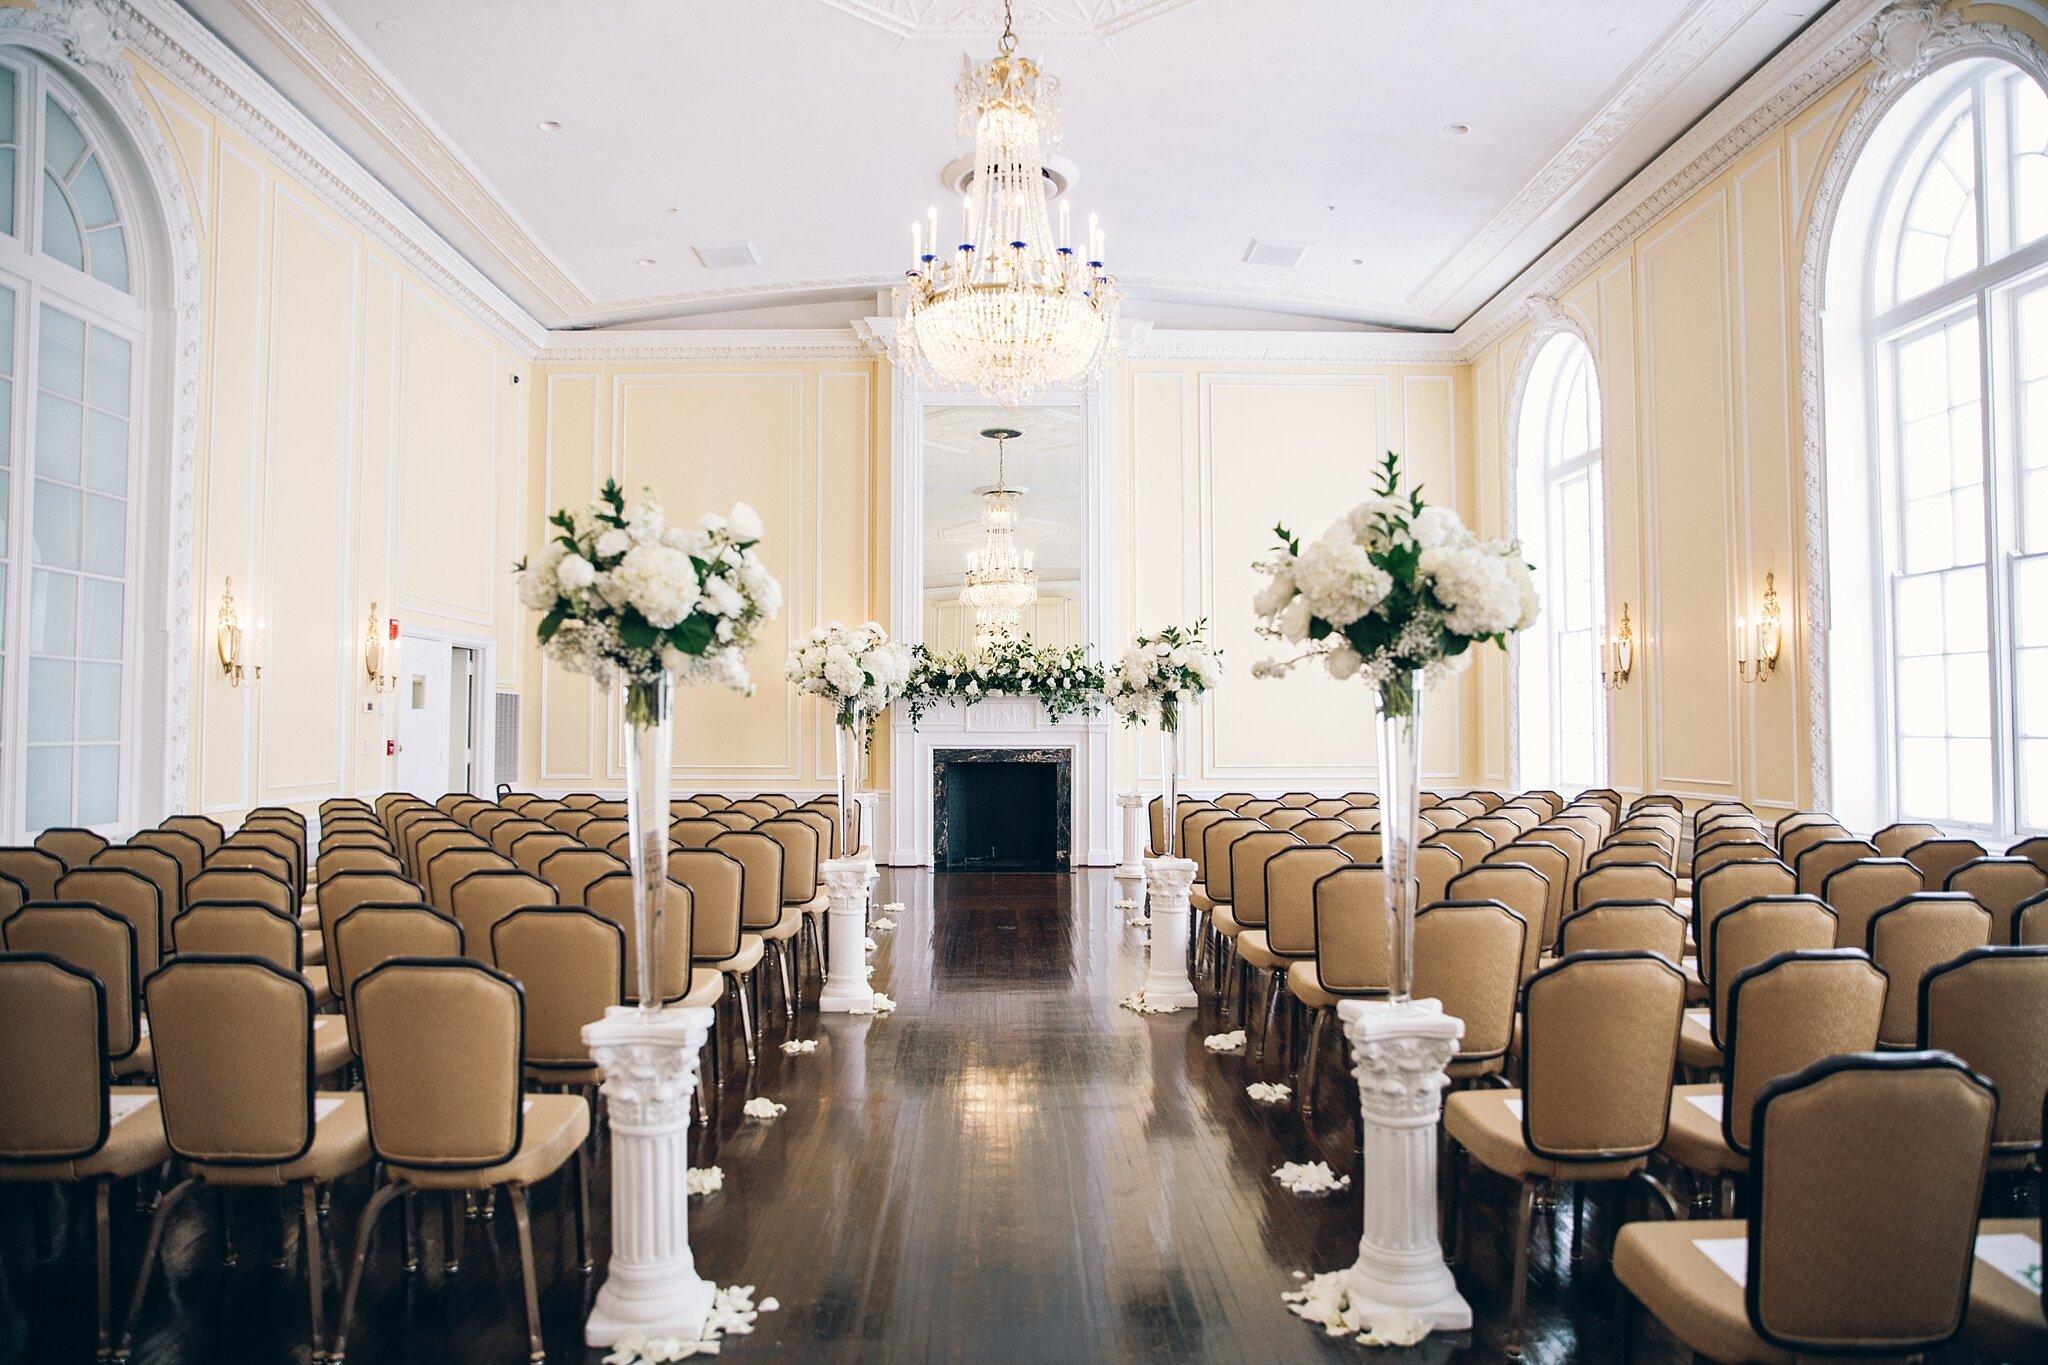 patrick-henry-ballroom-wedding-roanoke_0490.jpg